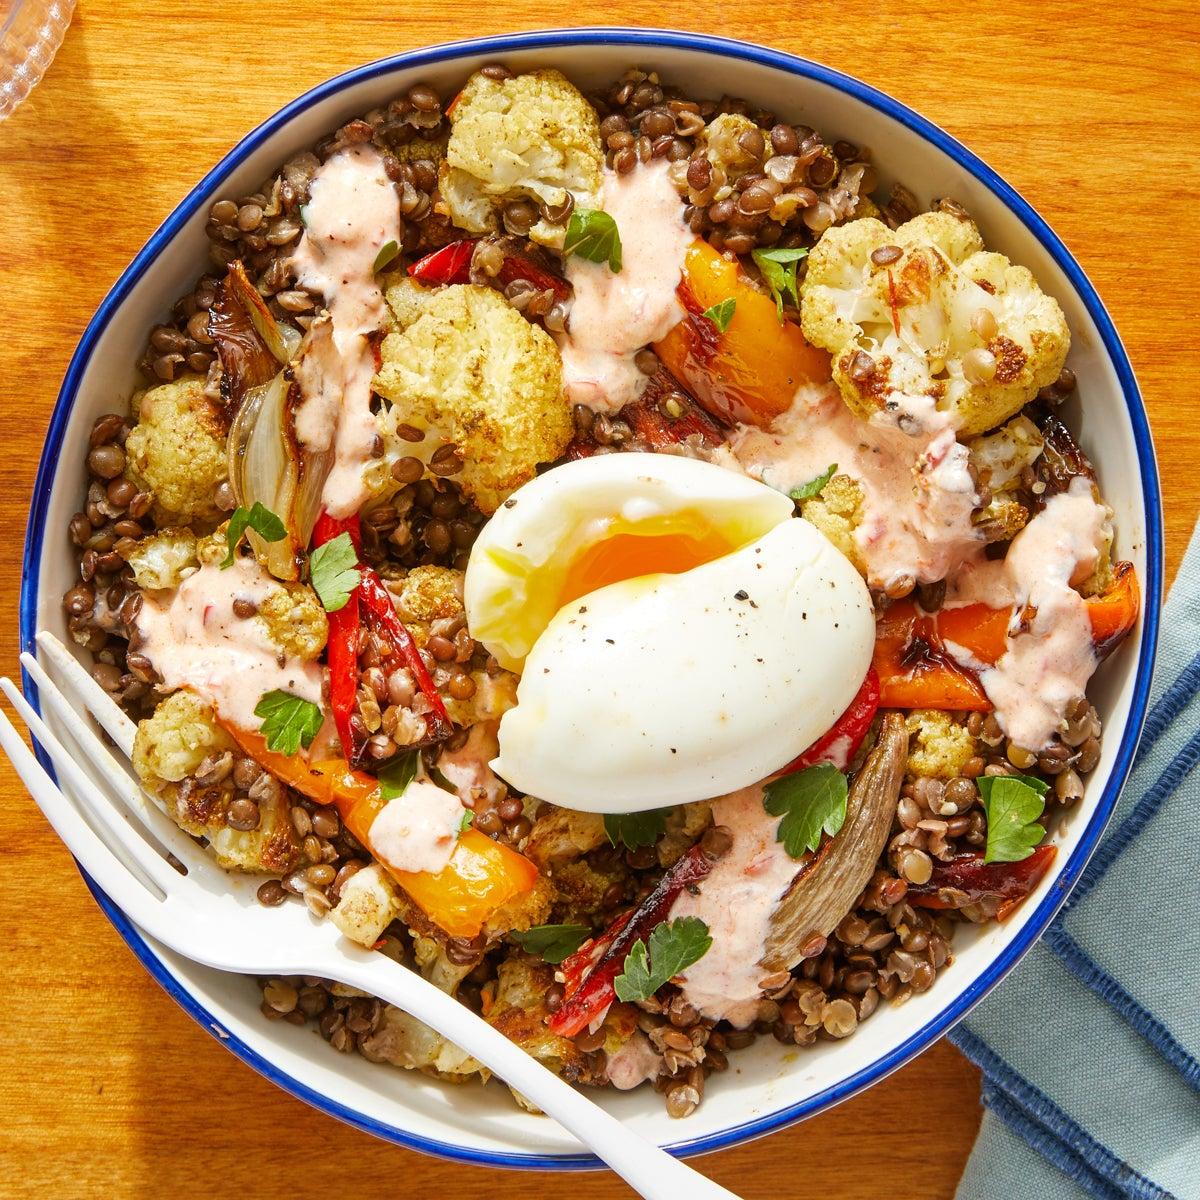 Za'atar-Roasted Cauliflower & Lentil Bowls with Soft-Boiled Eggs